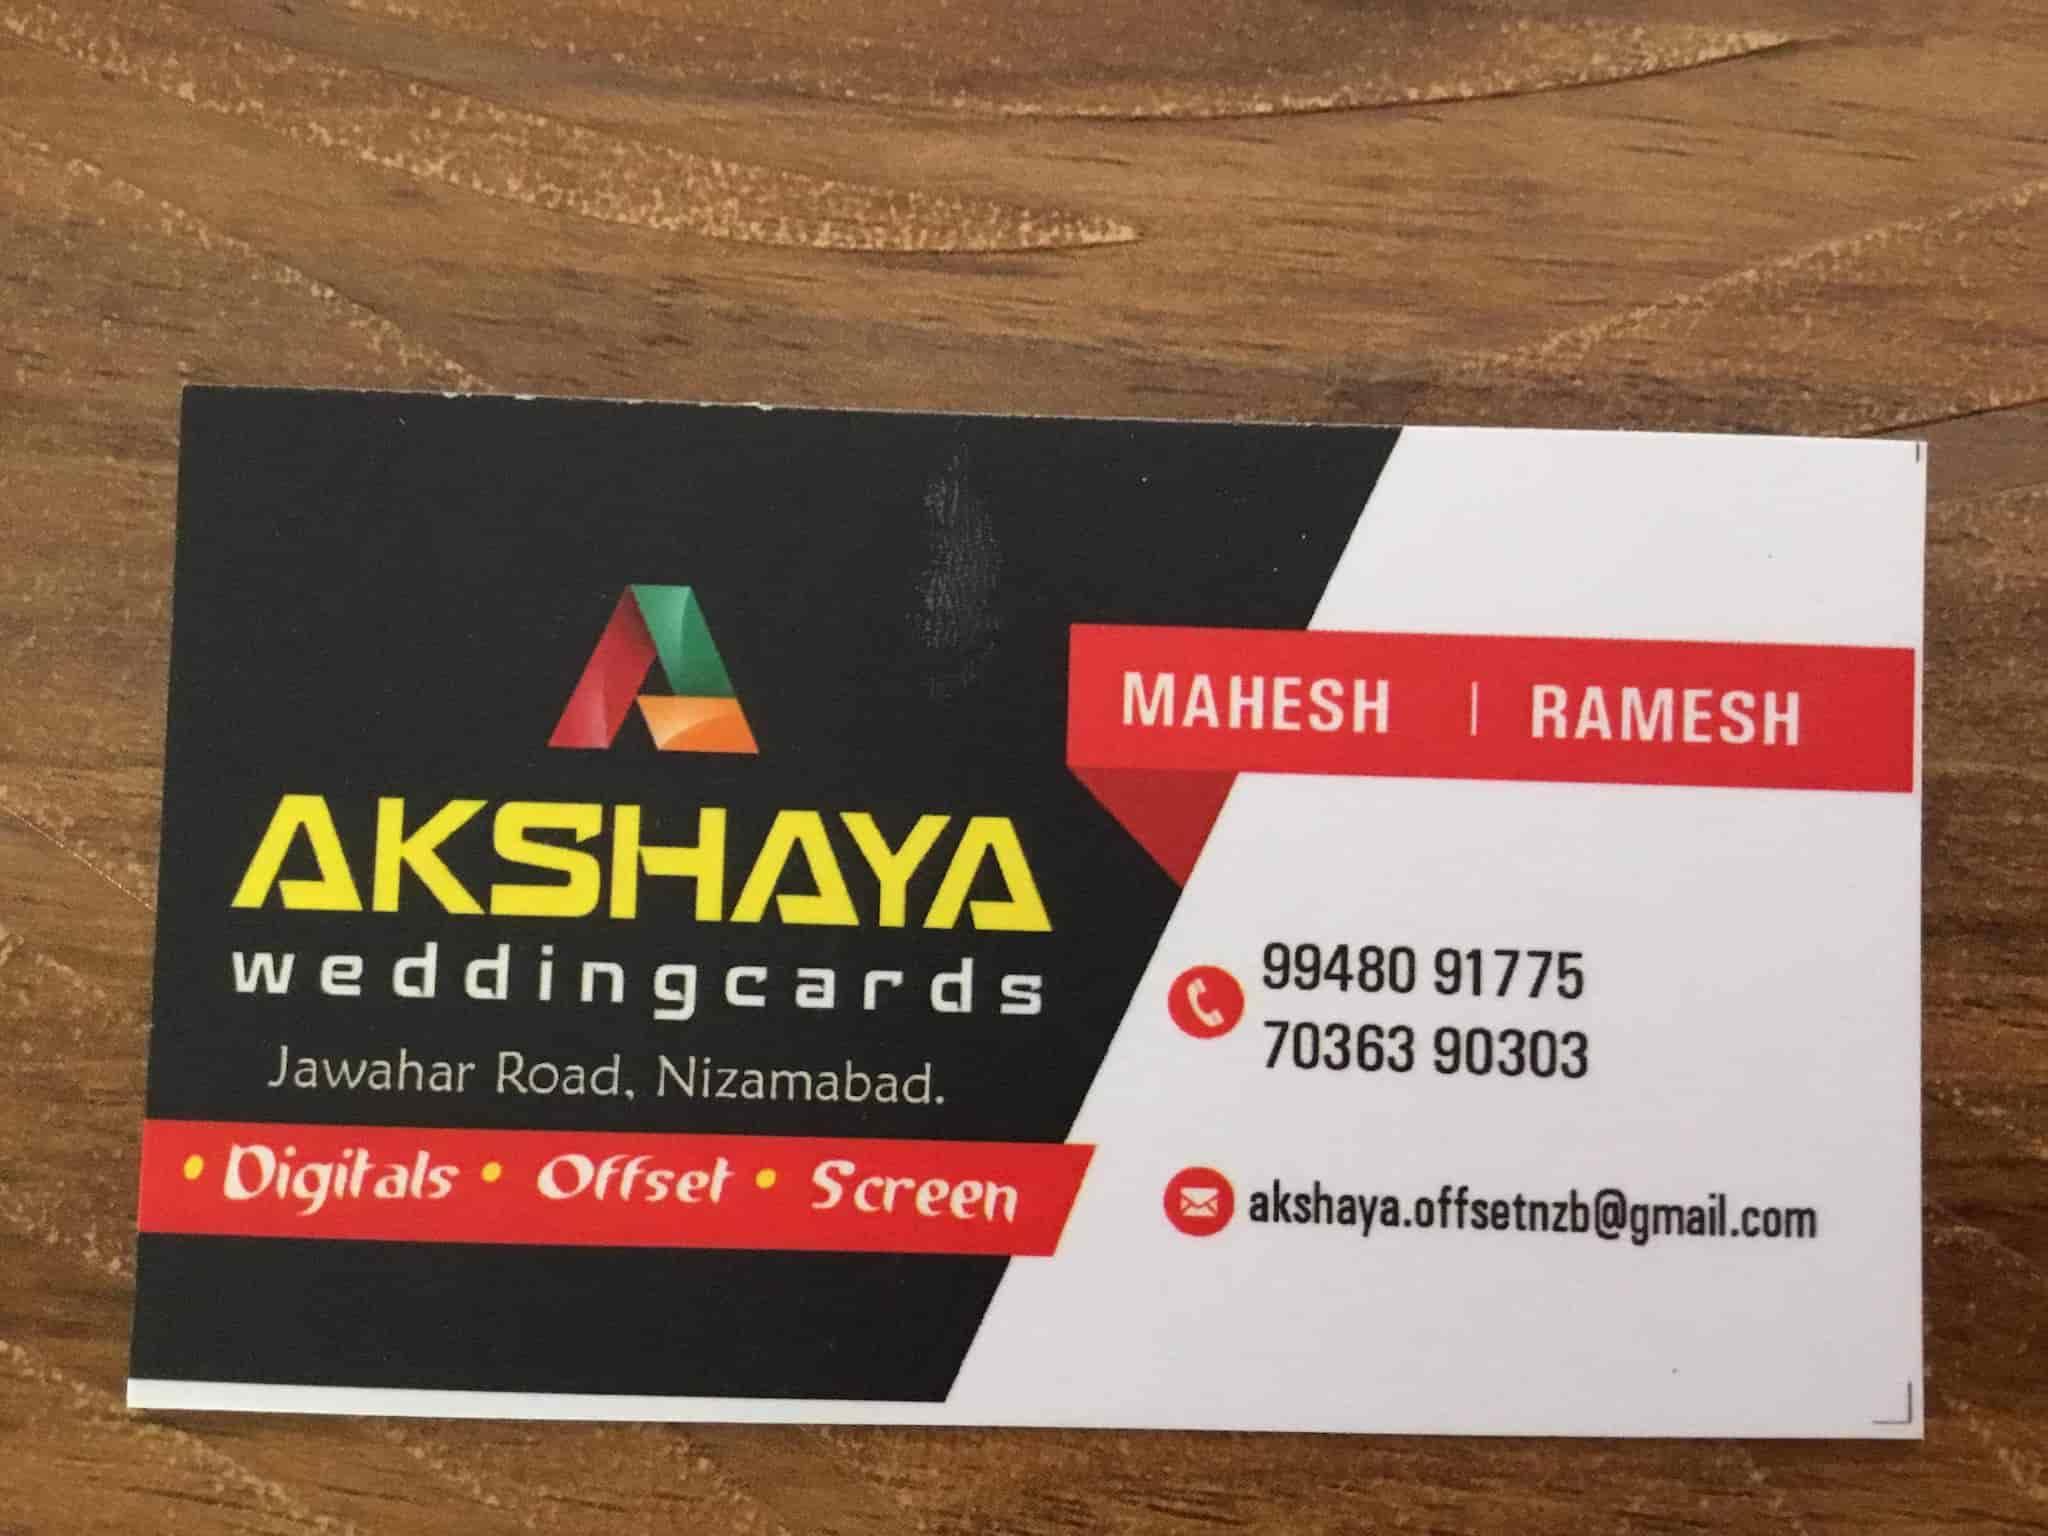 Akshaya Wedding Cards - Flex Printing Services in Nizamabad - Justdial